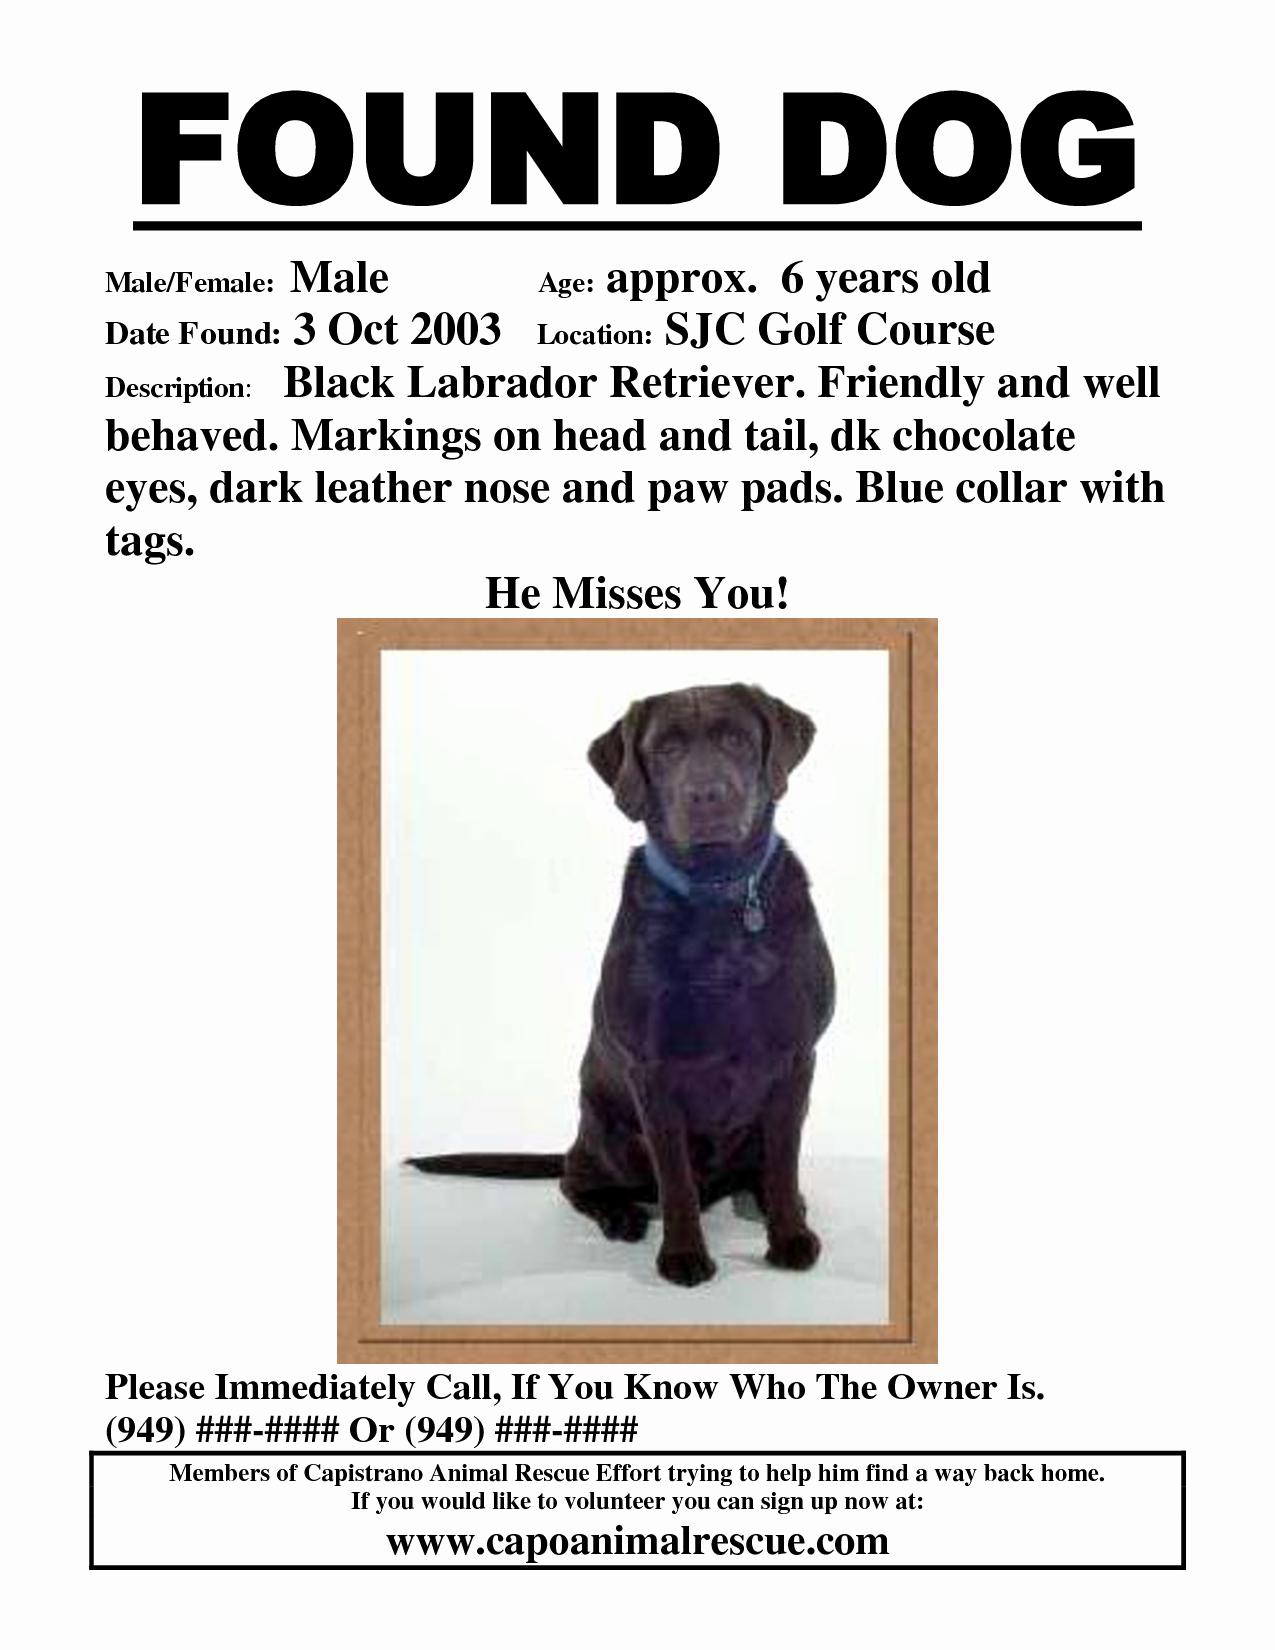 Missing Dog Flyer Template Fresh Found Dog Poster Template Portablegasgrillweber